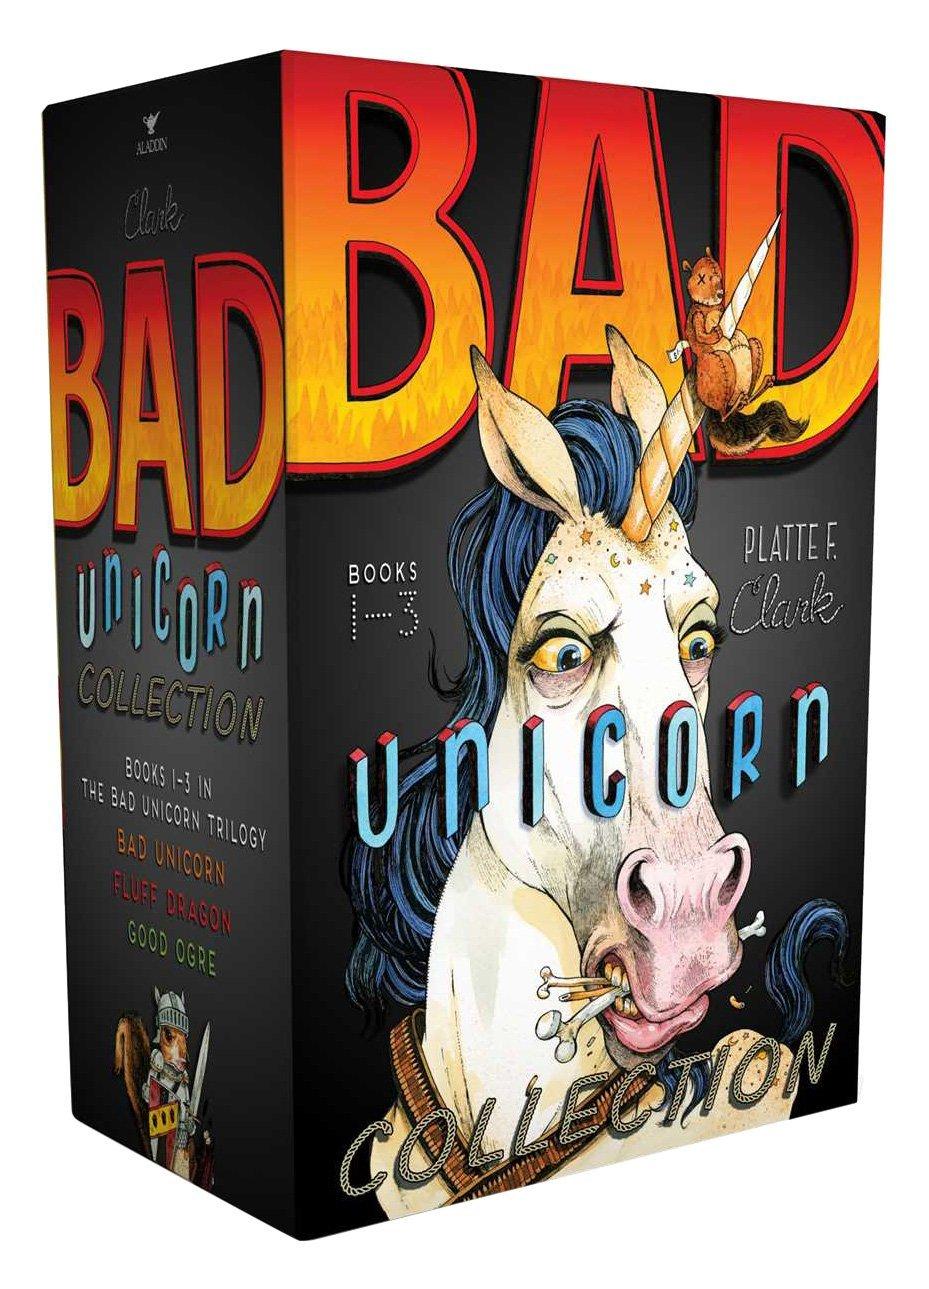 Bad Unicorn Collection: Bad Unicorn; Fluff Dragon; Good Ogre (The Bad Unicorn Trilogy)